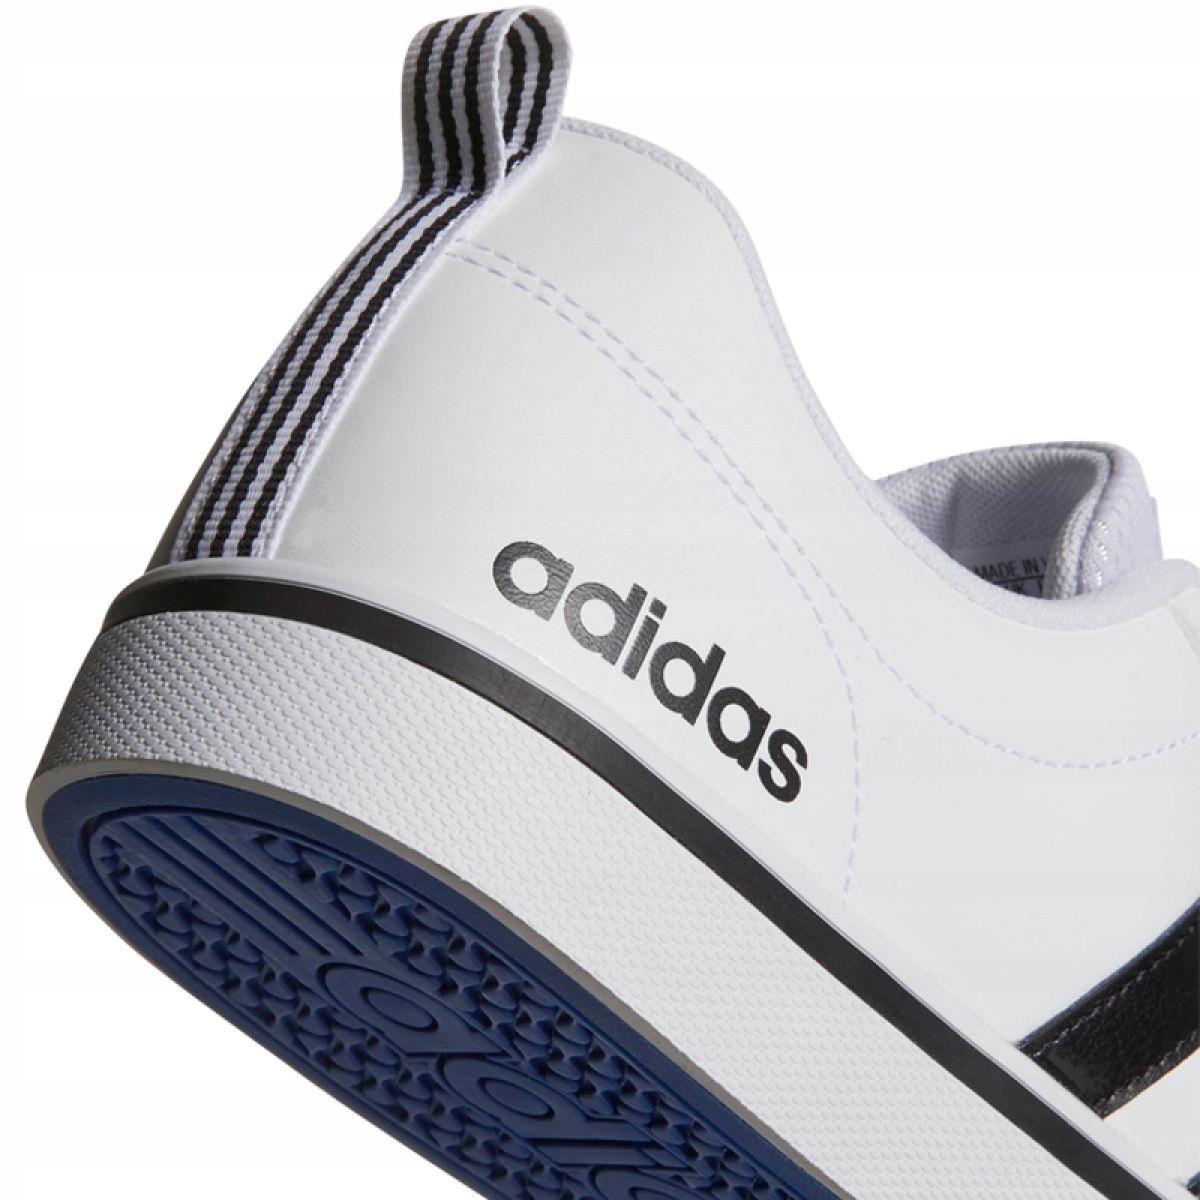 Details zu Weiß Adidas Vs Pace M AW4594 Schuhe